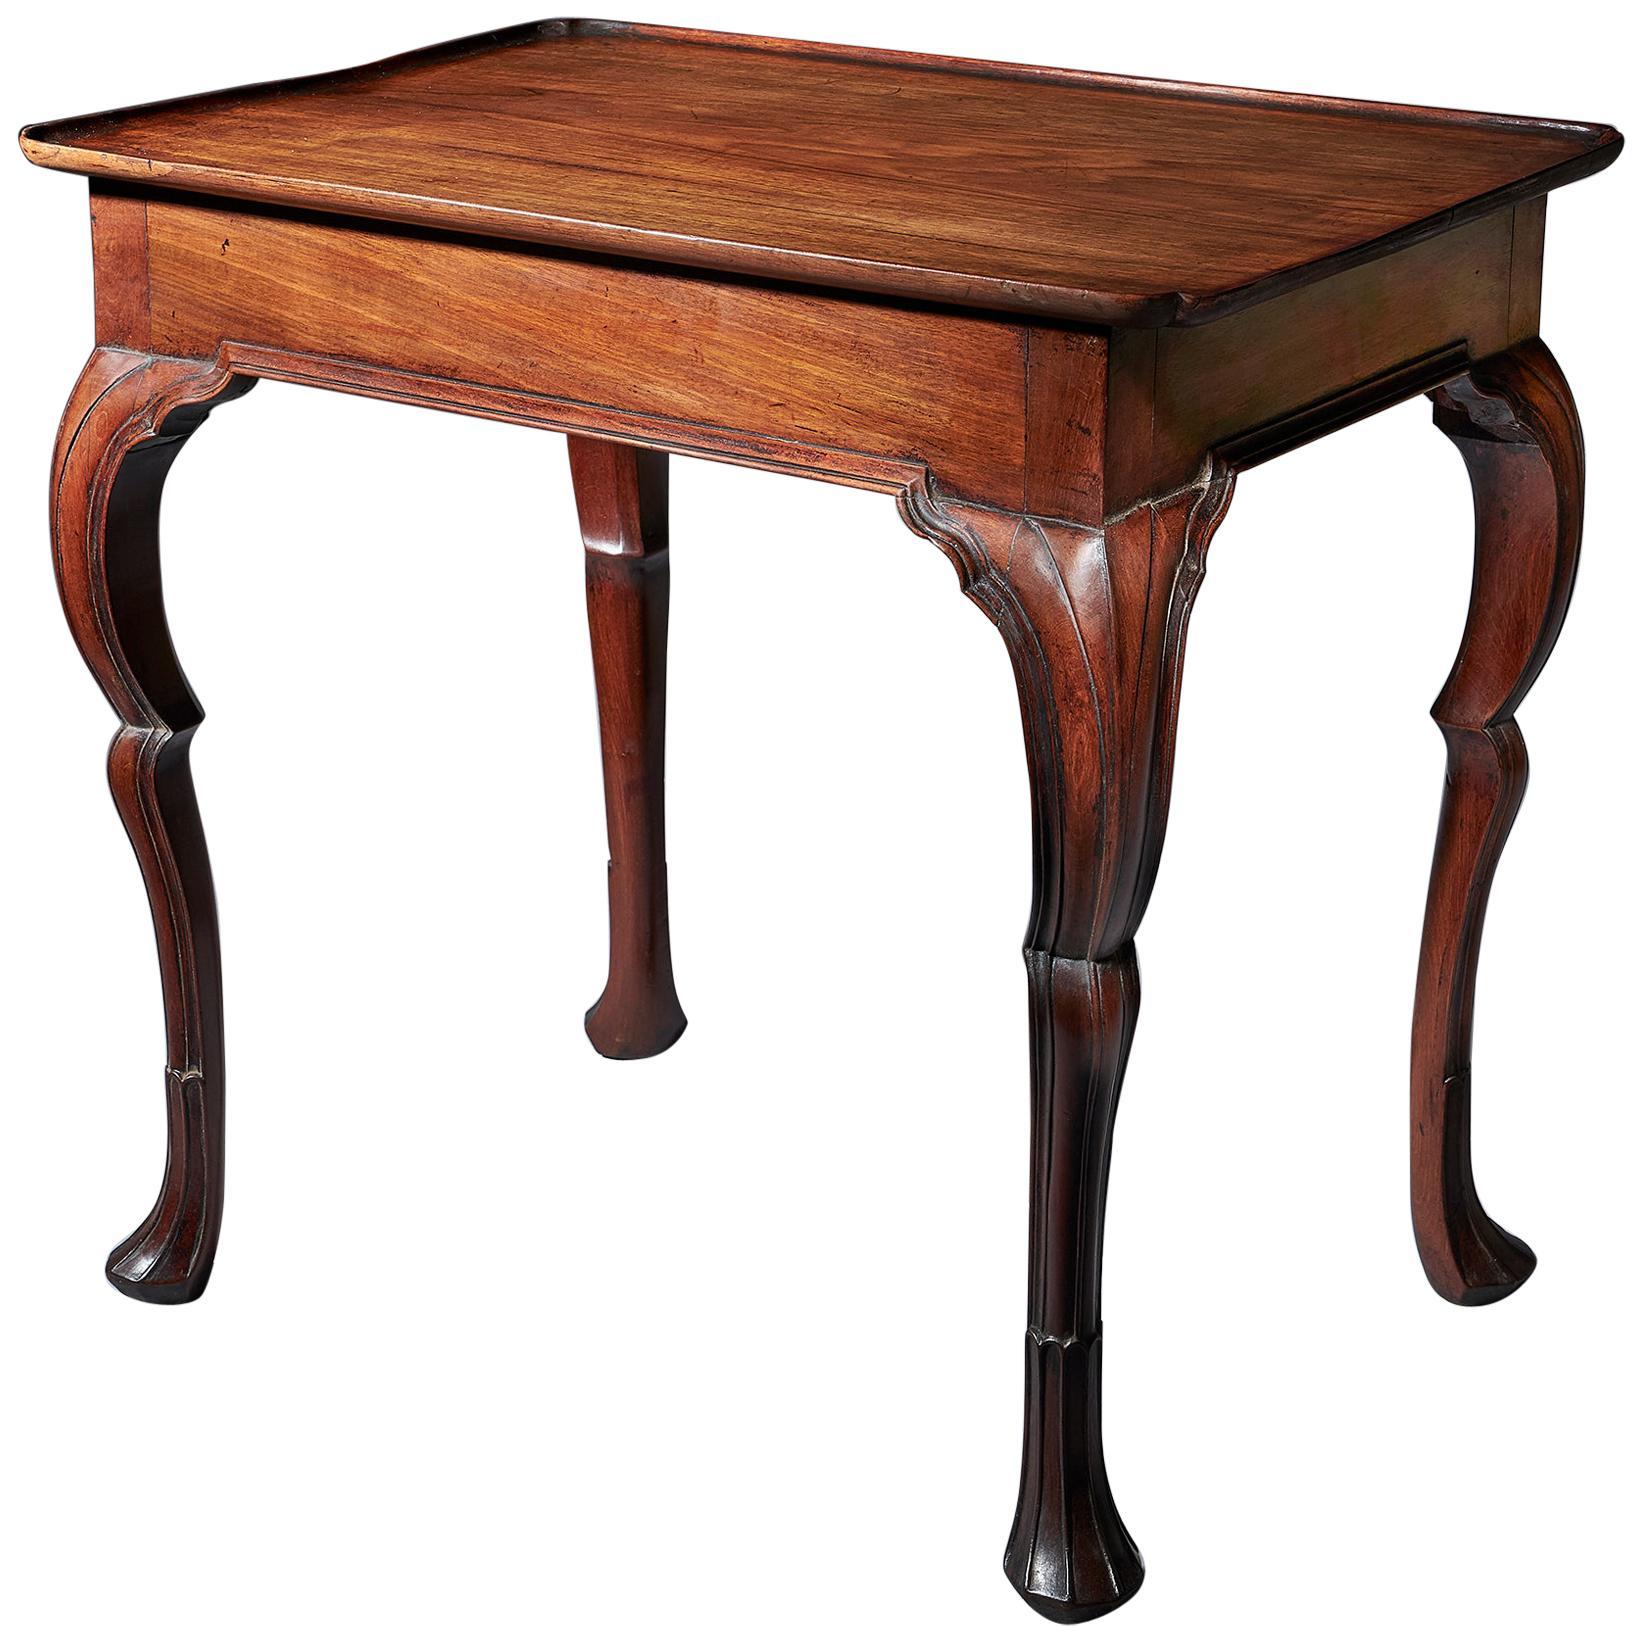 Important 18th Century Mahogany Irish Silver or Tea Table, circa 1740-1760